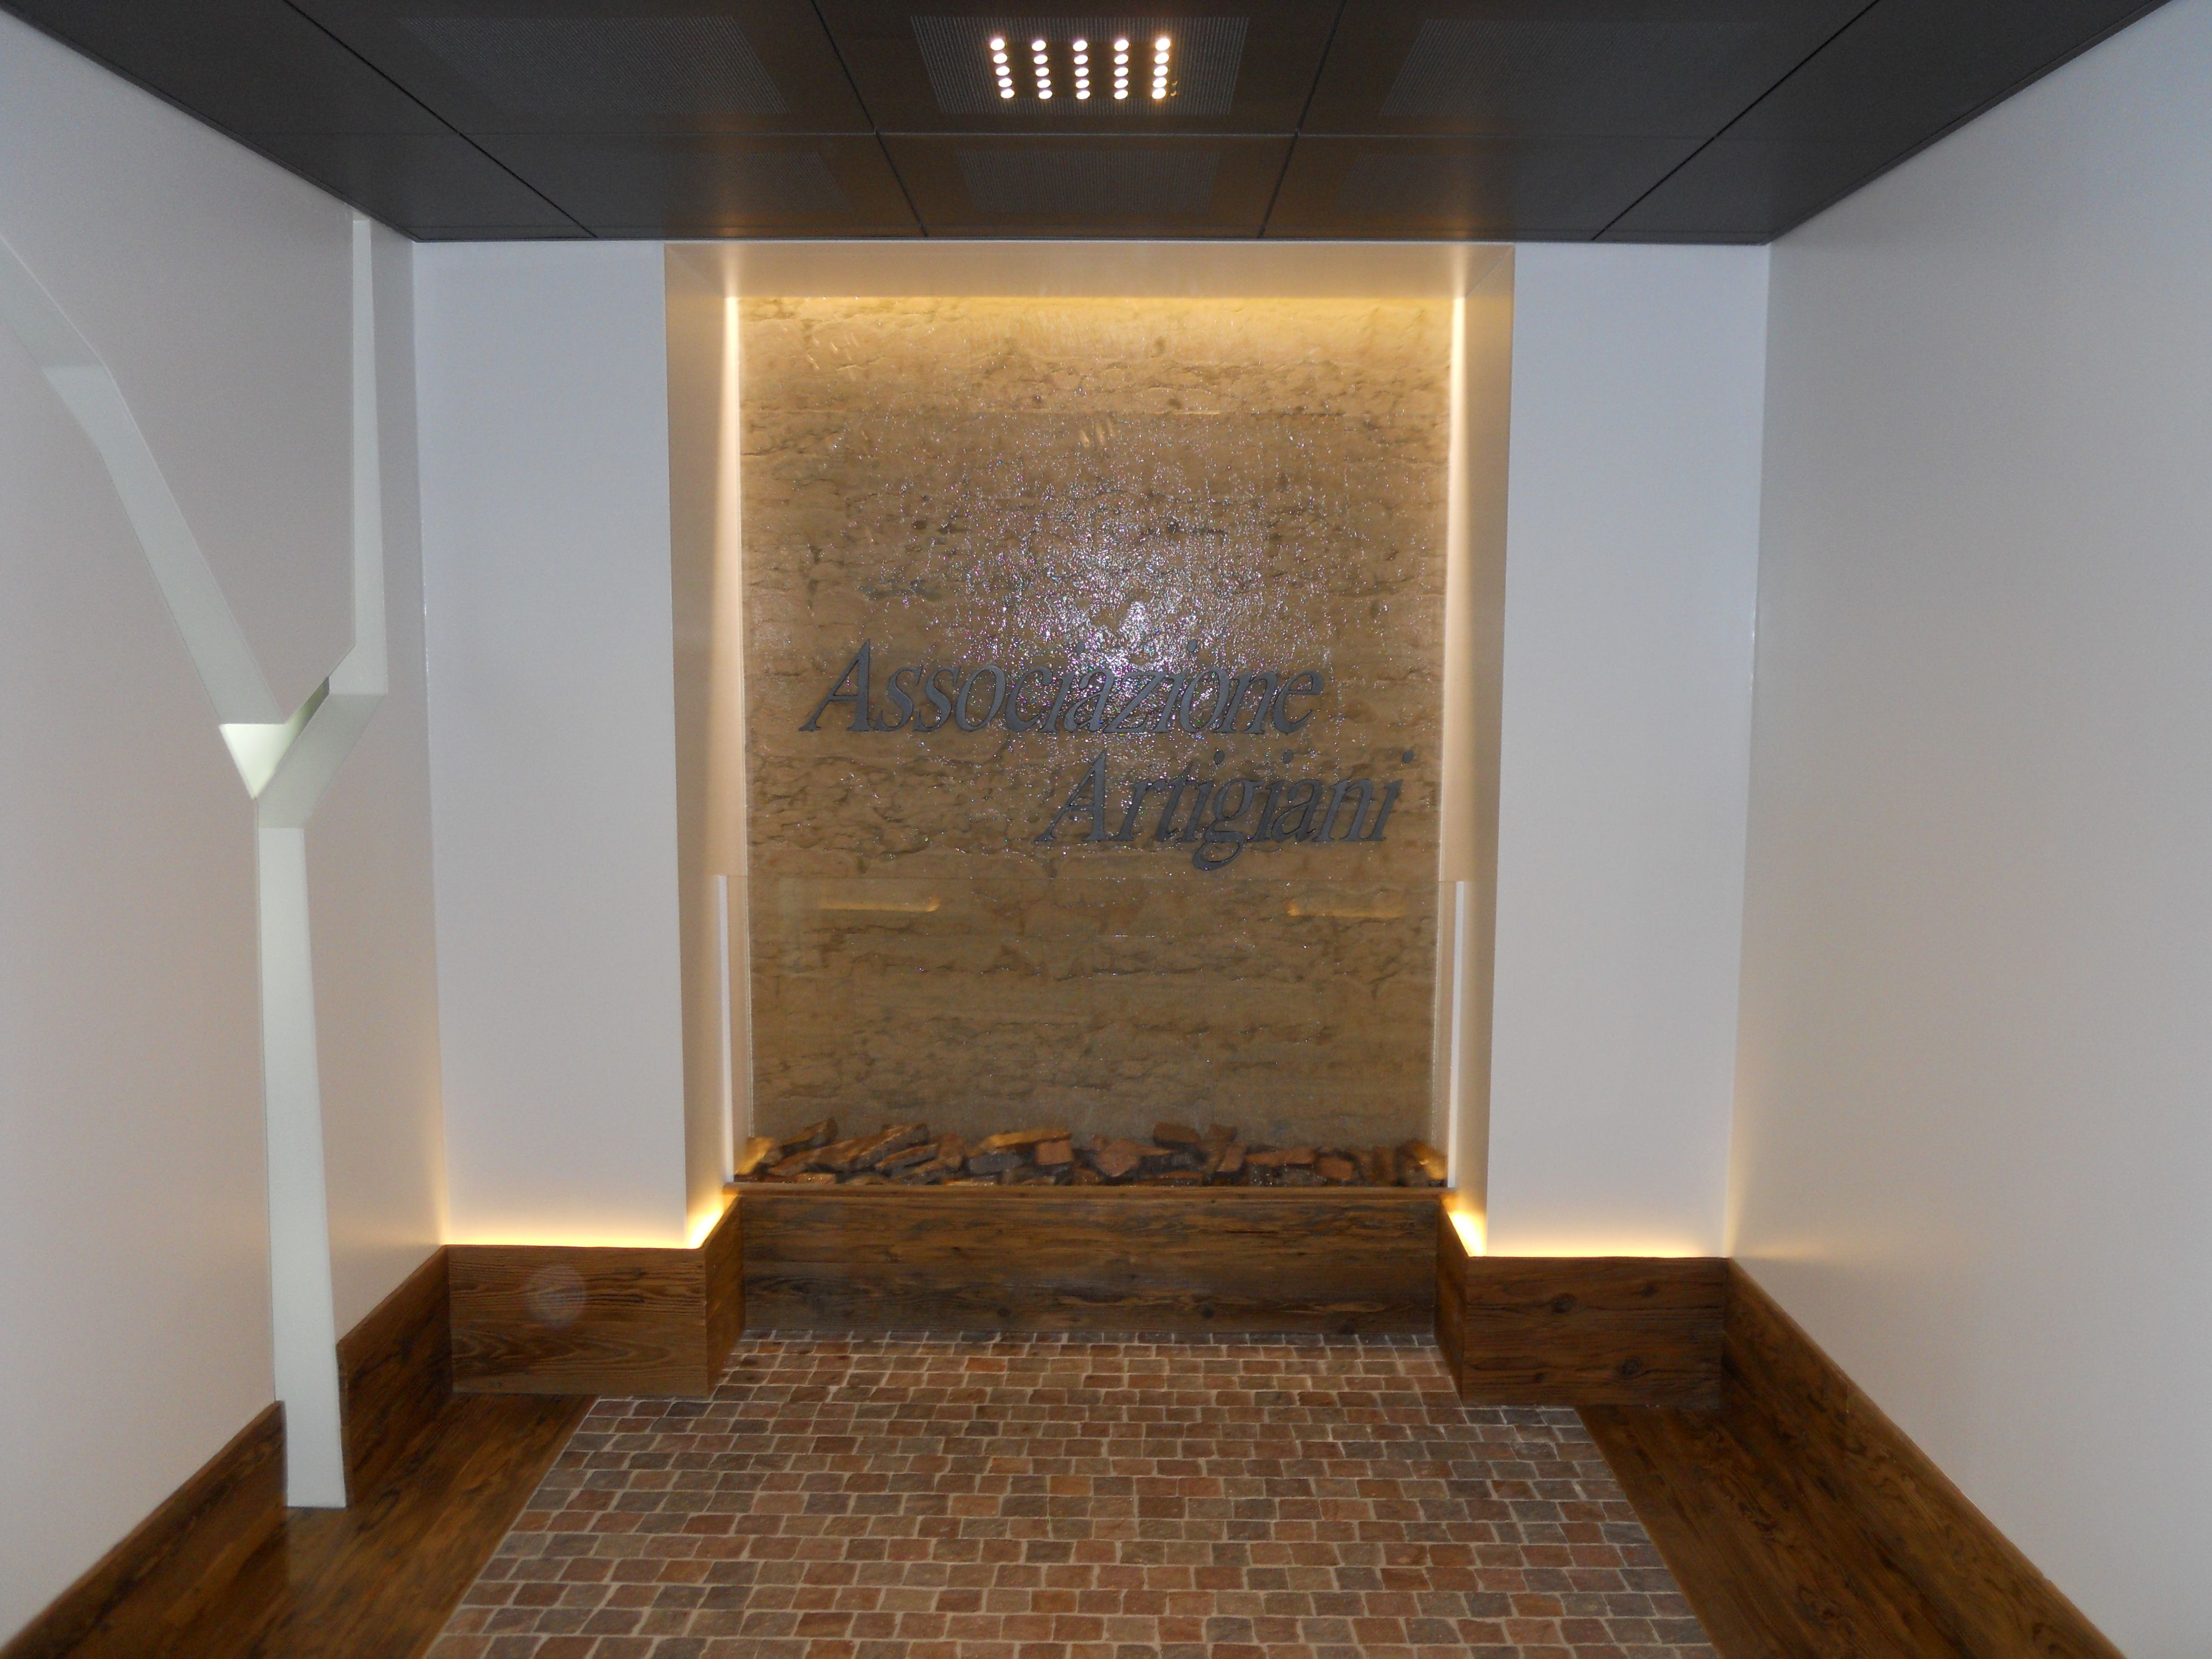 Wasserwand Wohnzimmer wasserwand wohnzimmer wasserwand glas modulare rahmenlose